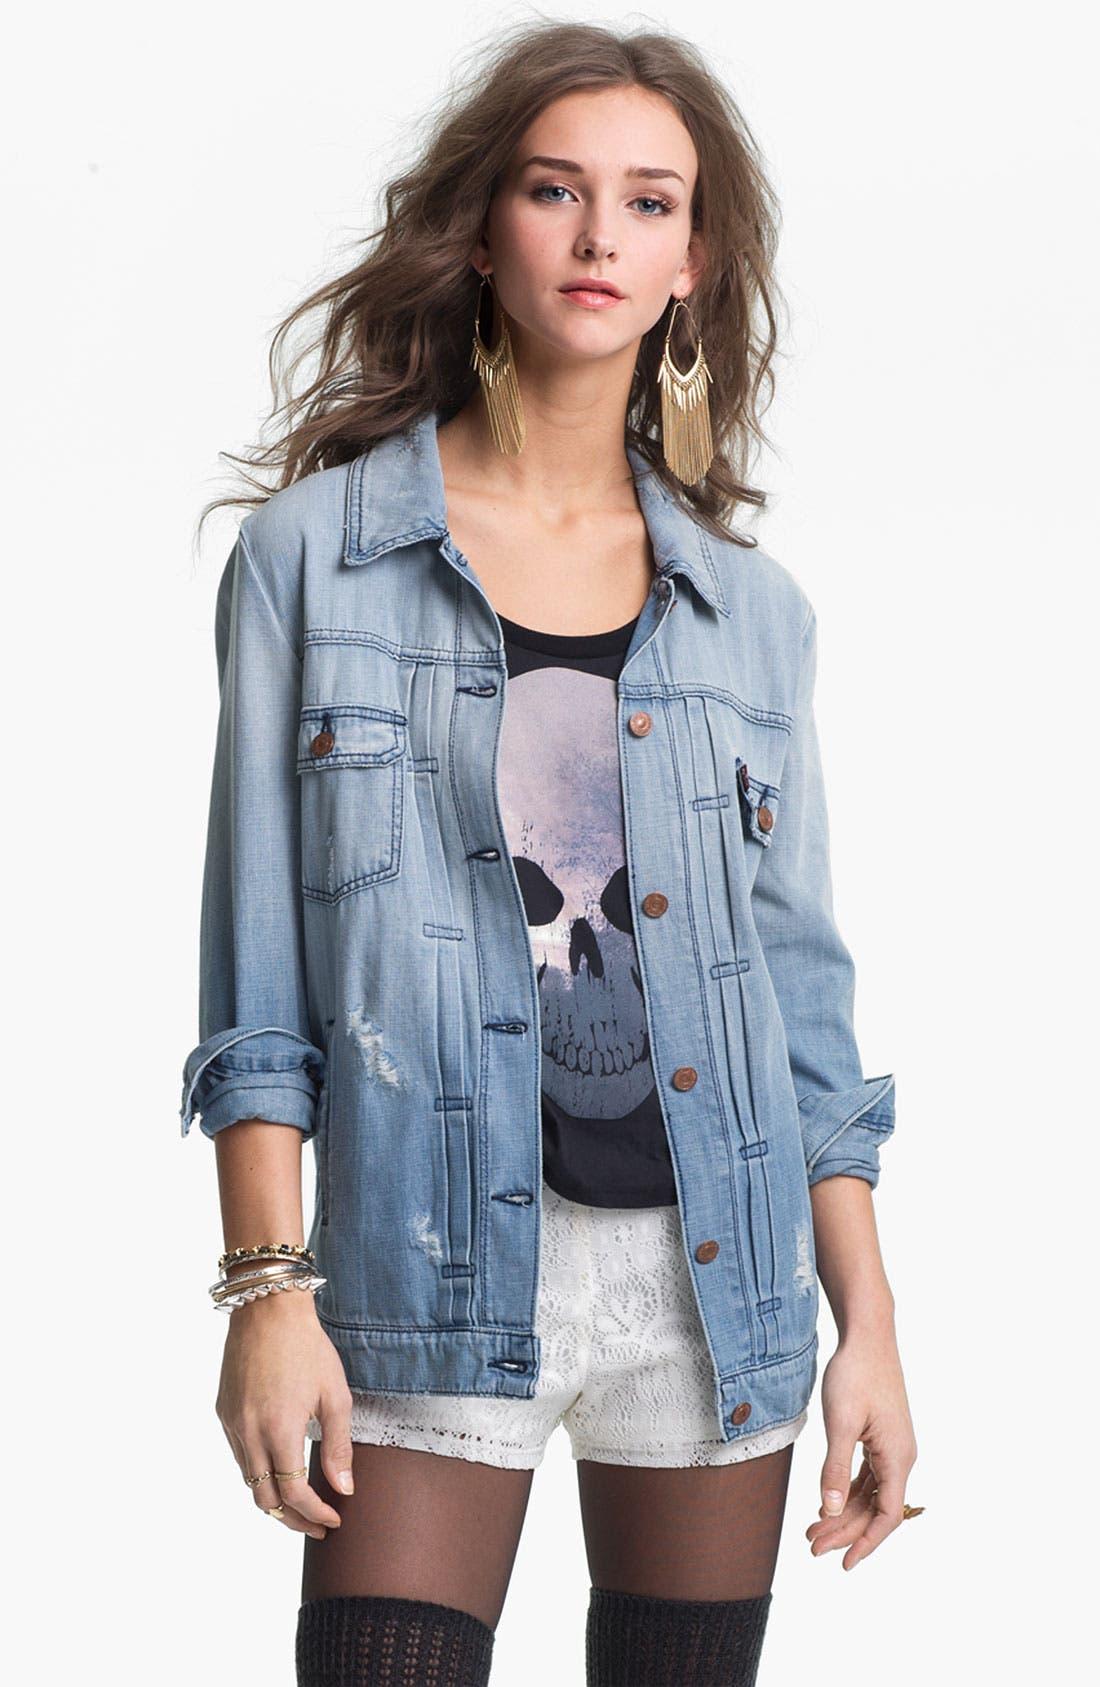 Alternate Image 1 Selected - Levi's® 'Trucker' Oversized Denim Jacket